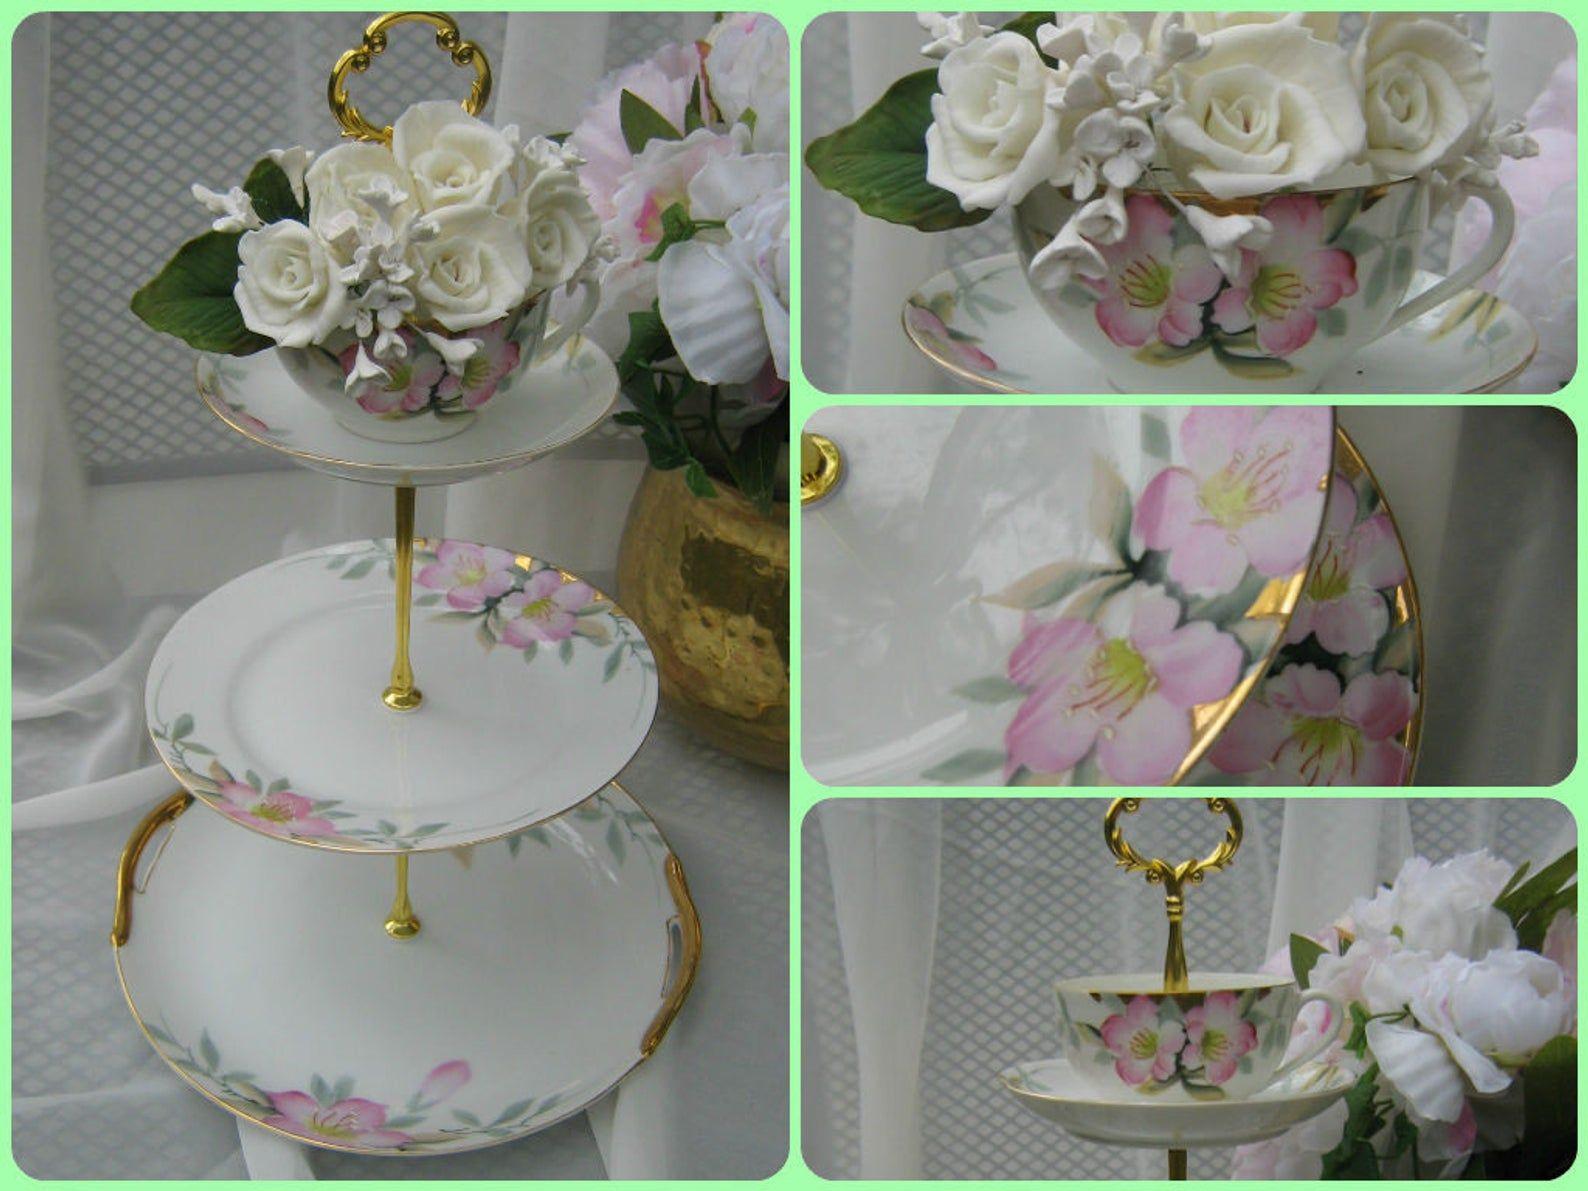 Antique noritake azalea 3 tier wedding cake stand pink